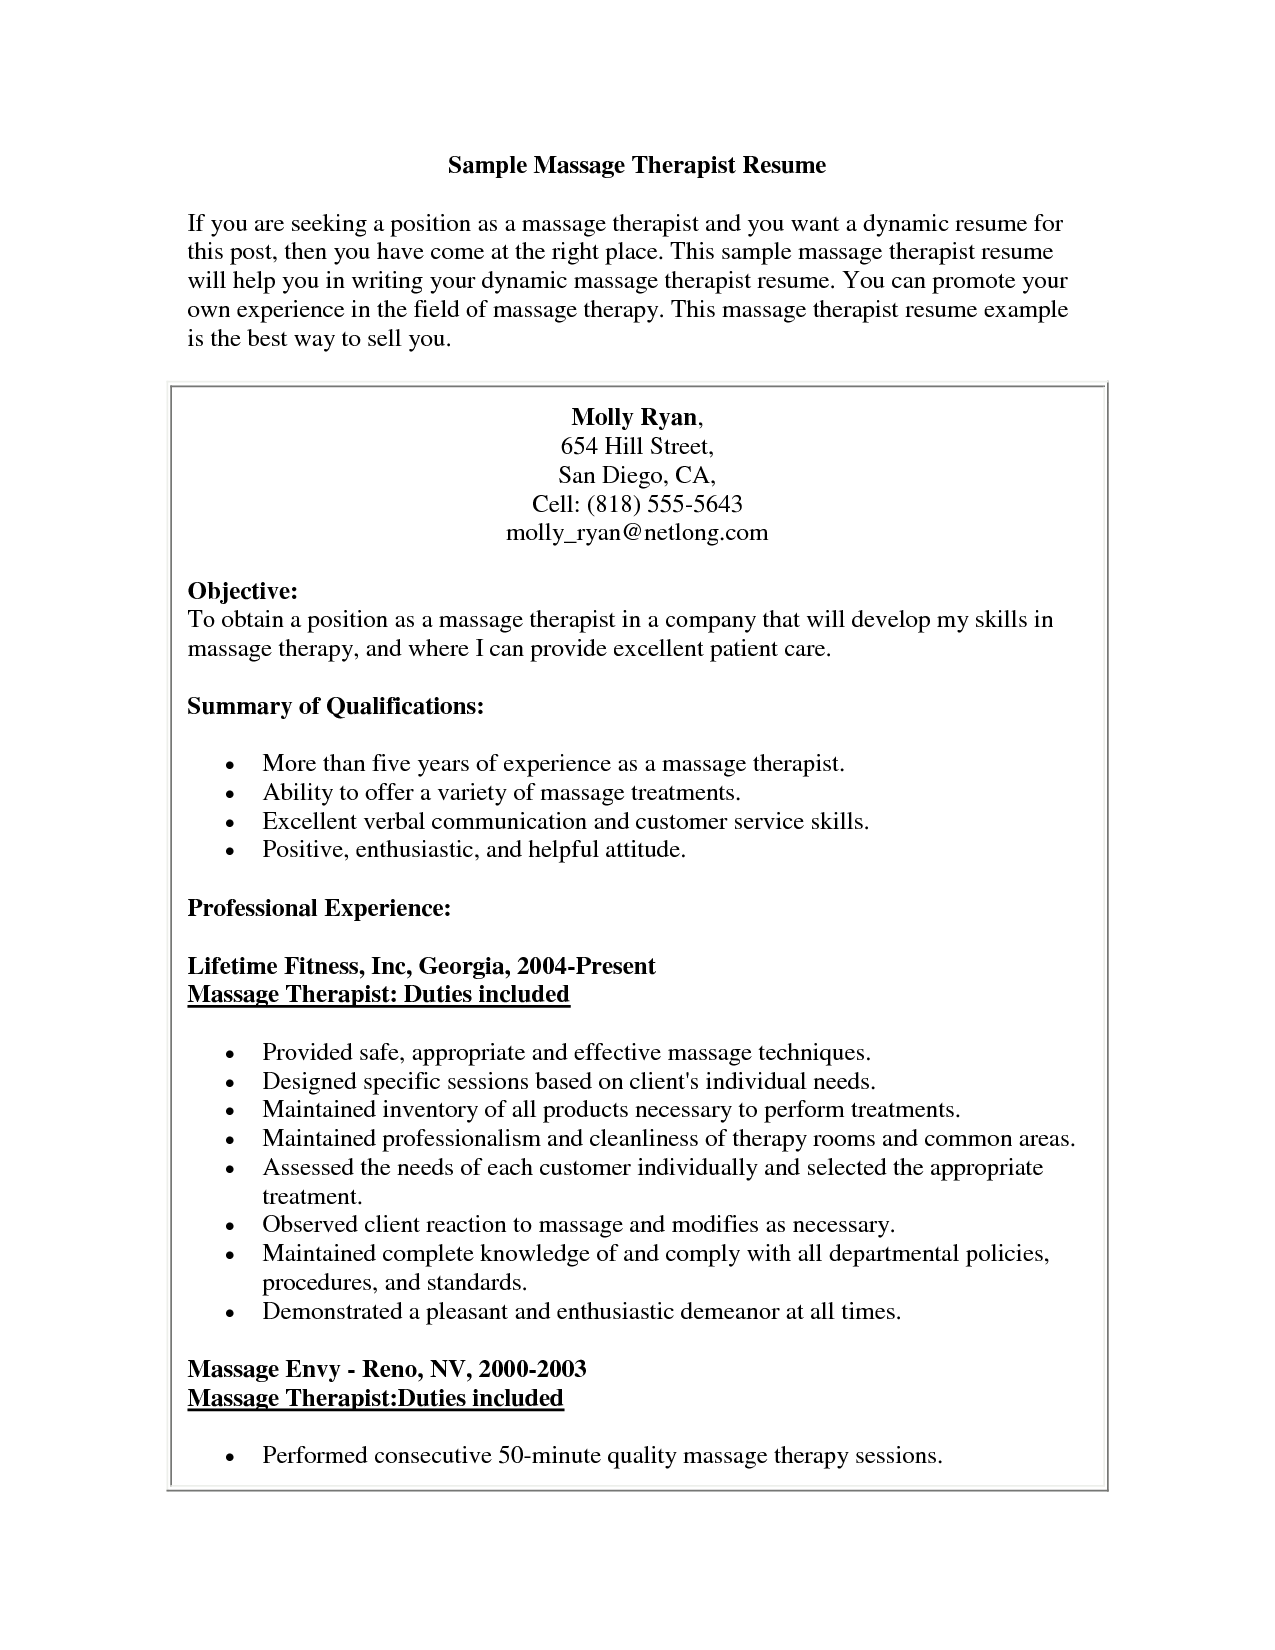 Massage Therapist Resume Sample Massage Therapist Resume